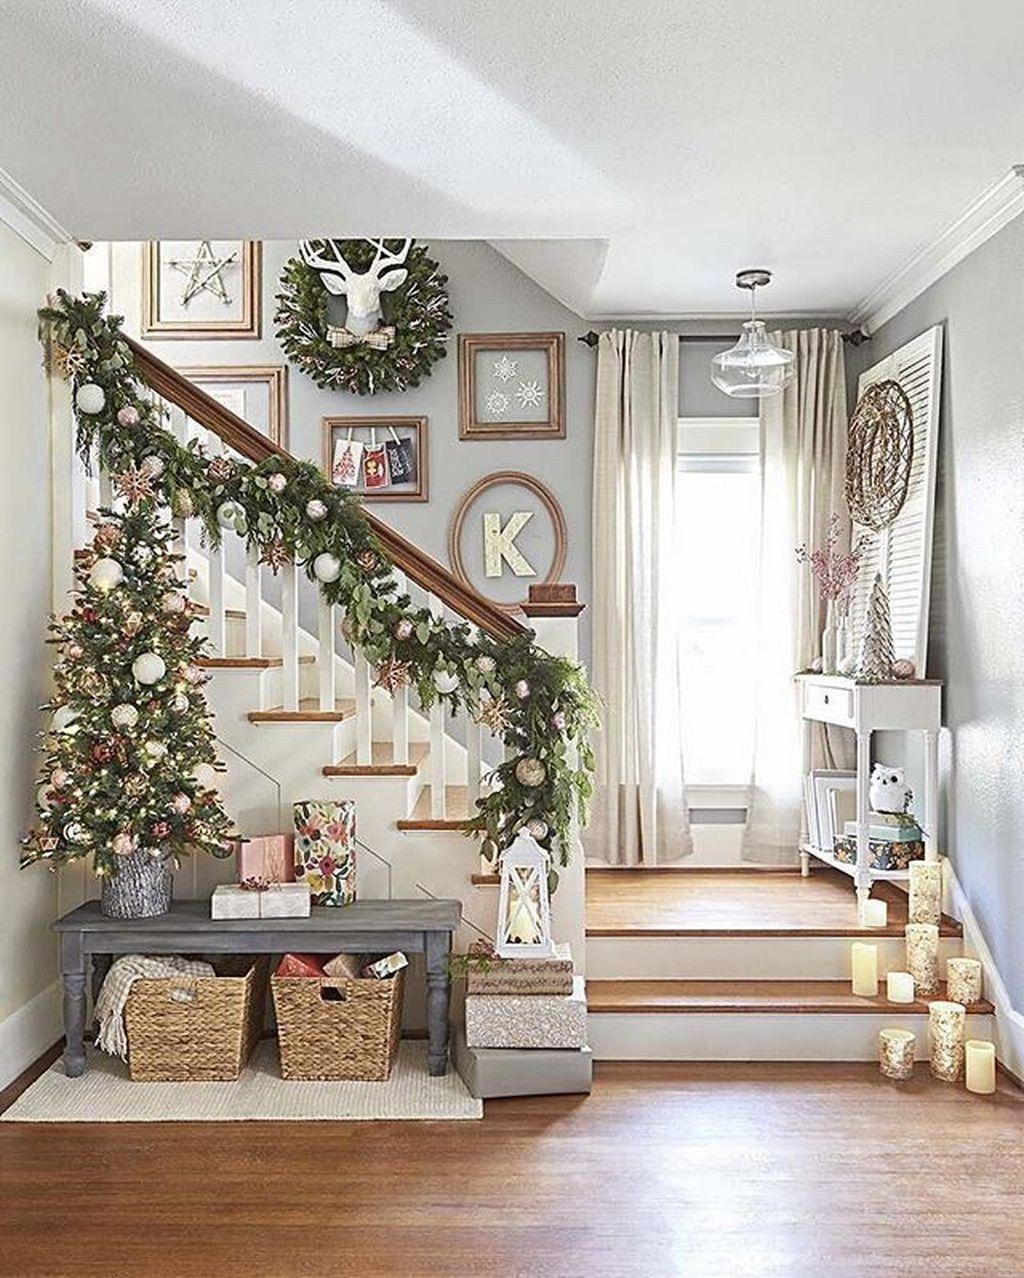 Unordinary Christmas Home Decor Ideas 12